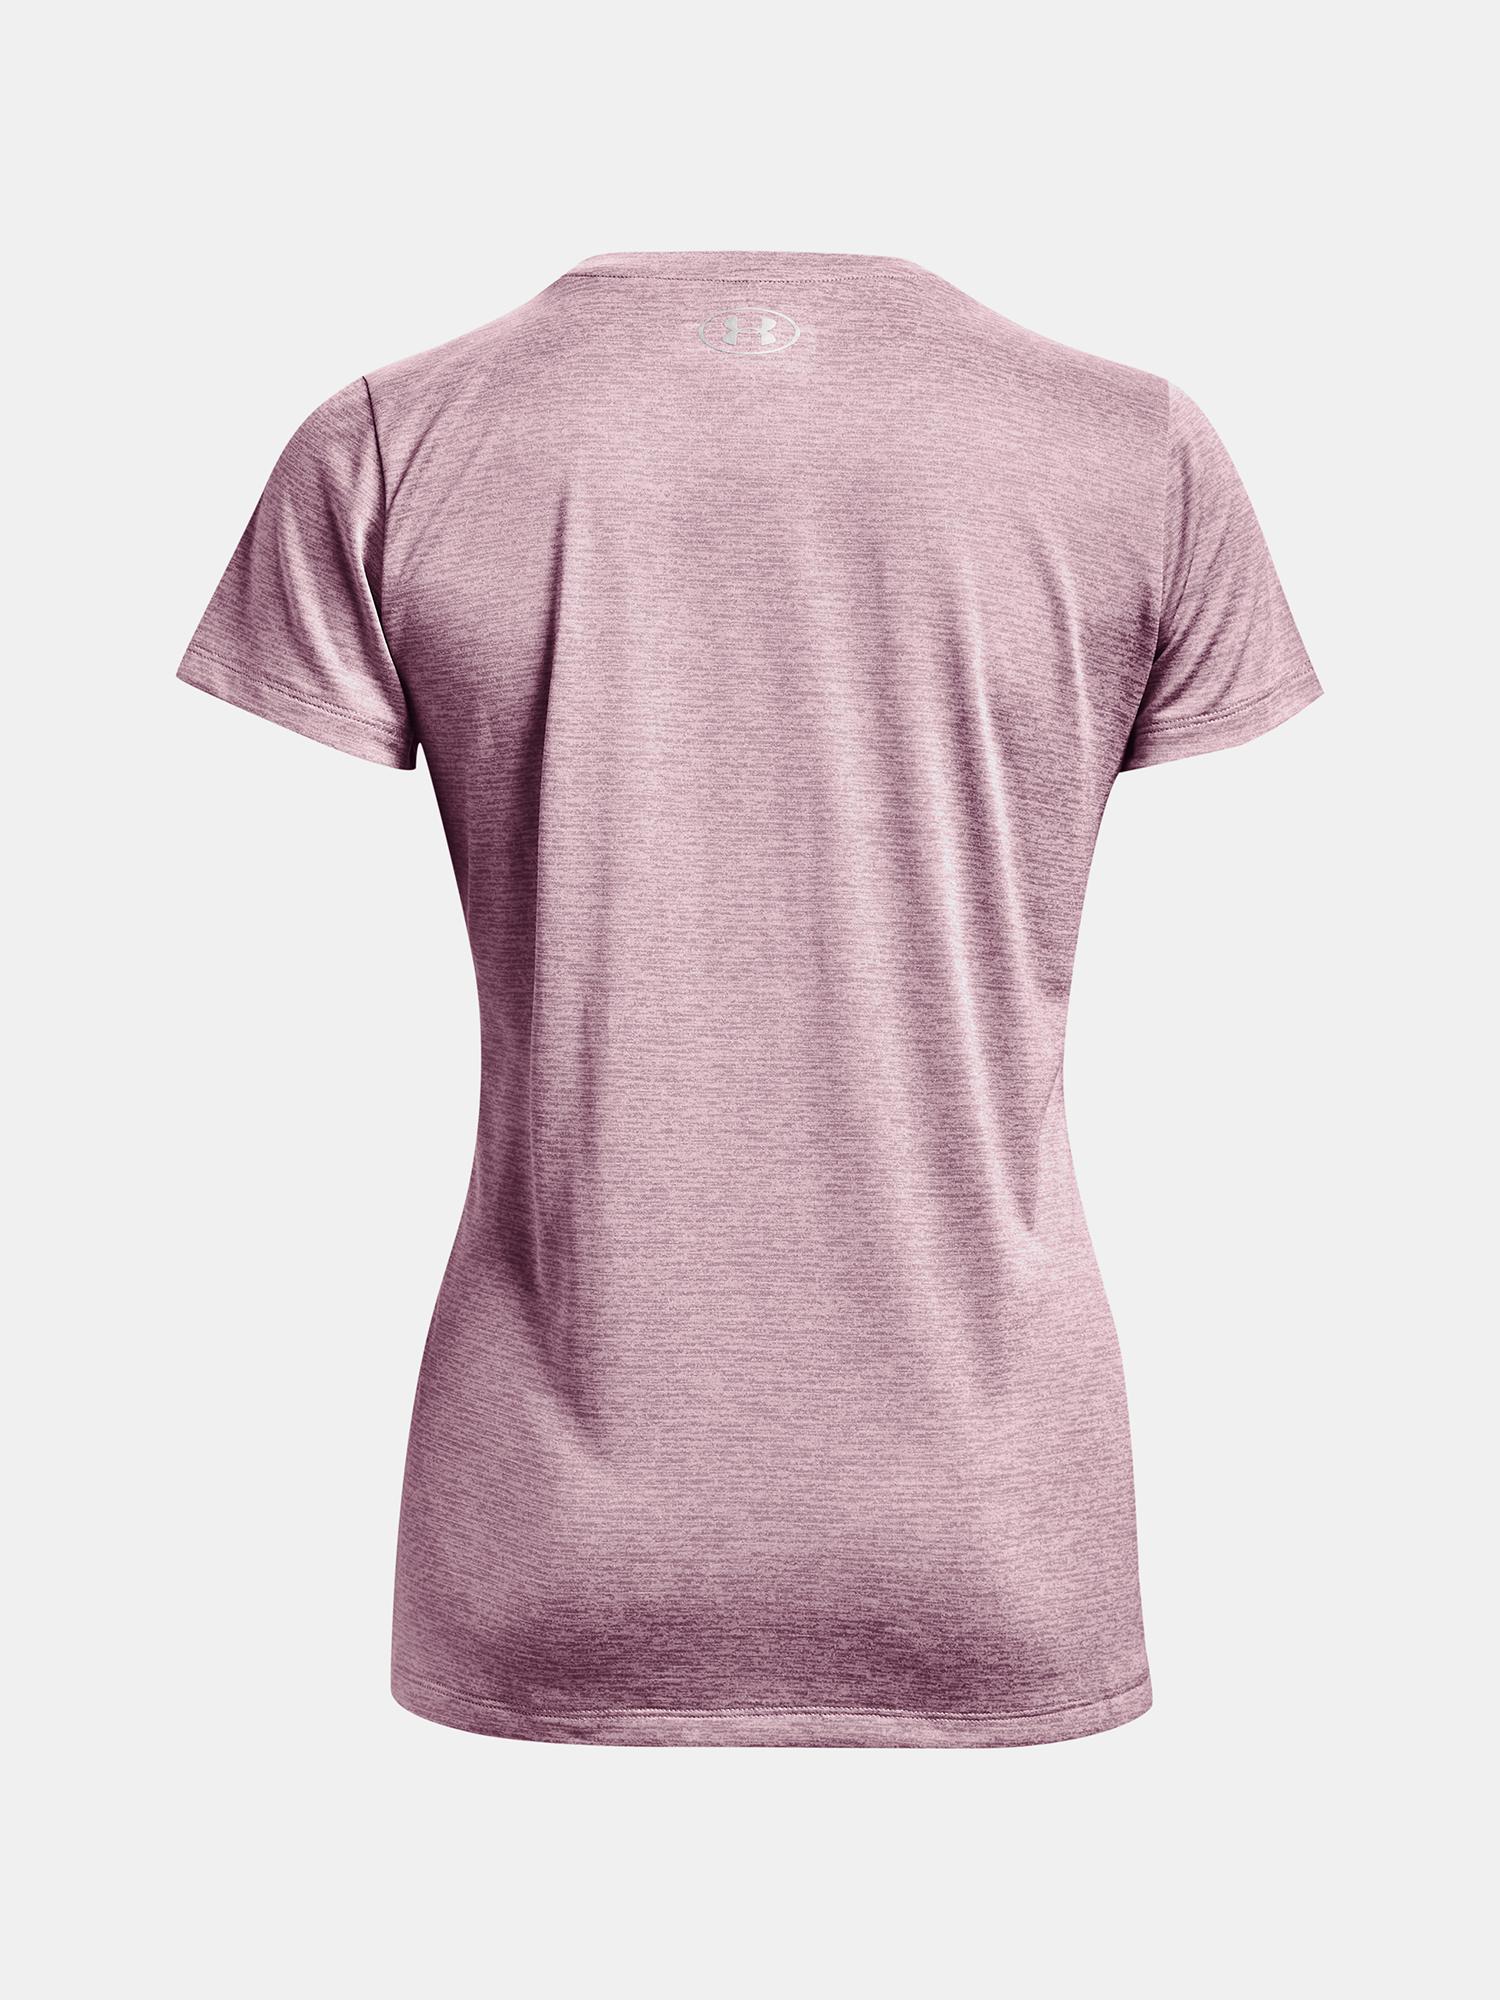 Under Armour Maglietta donna rosa